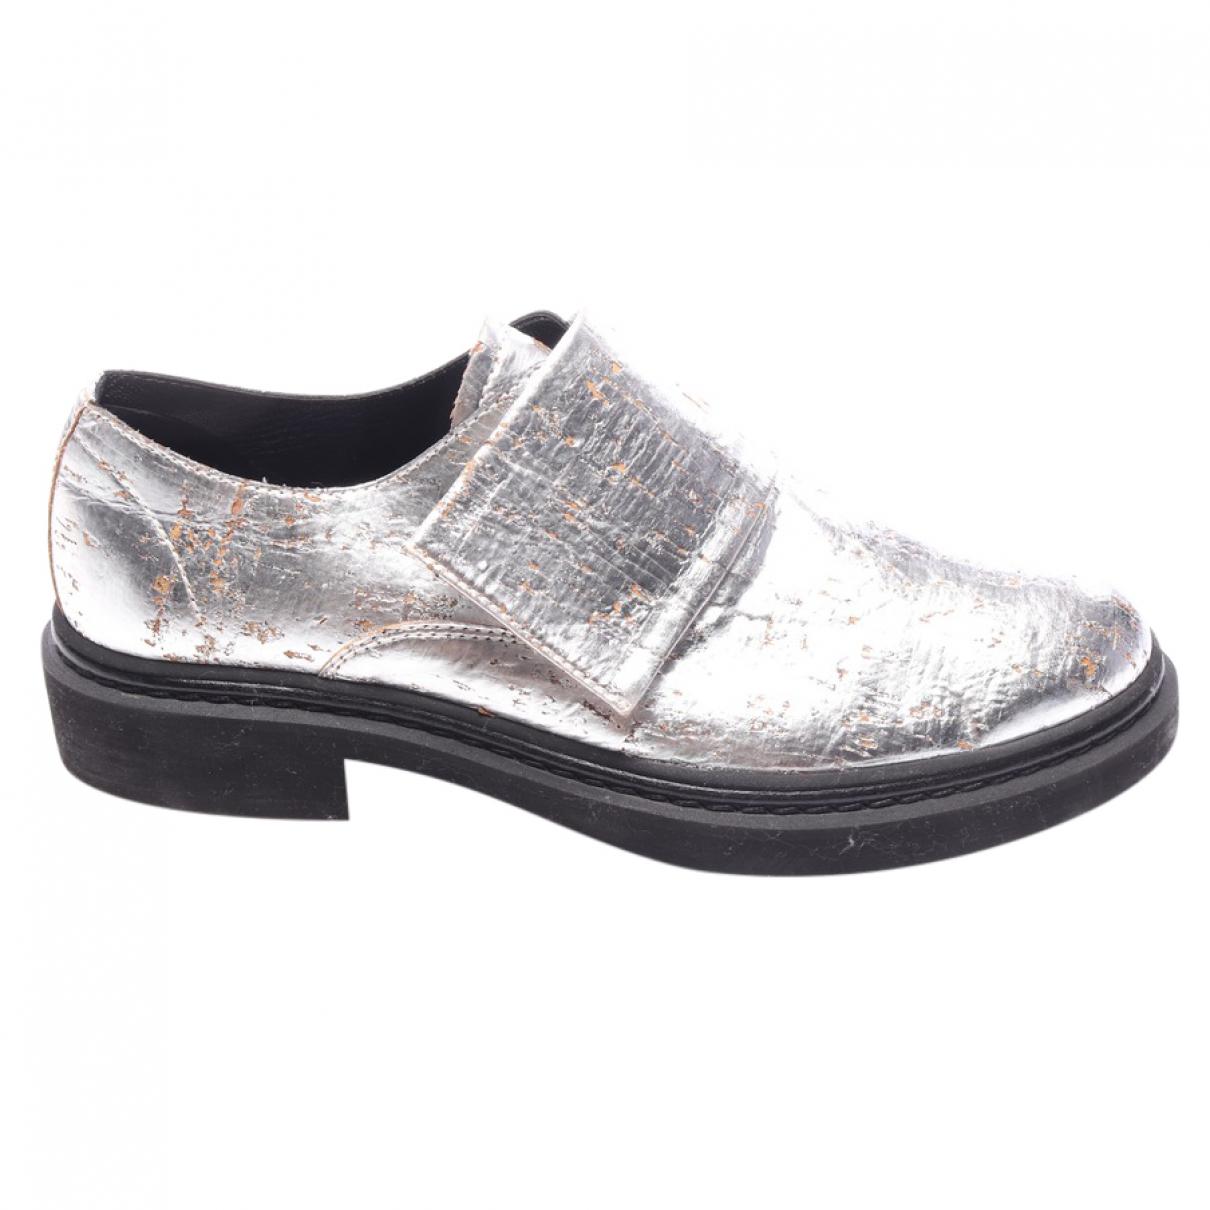 Alexander Mcqueen \N Metallic Leather Flats for Women 39 EU